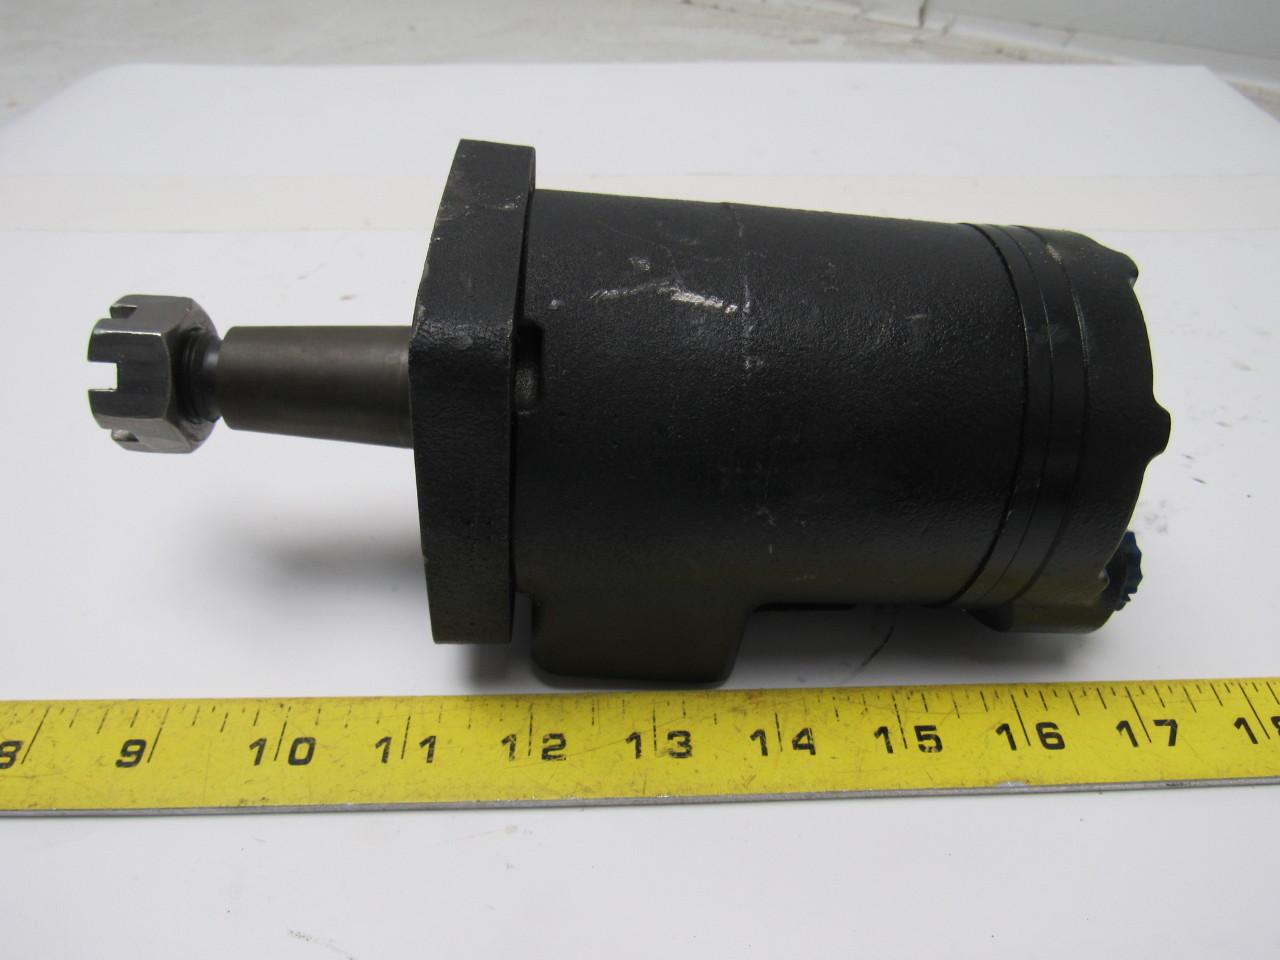 Eaton 130-1329-003 A Series Hydraulic Motor 1